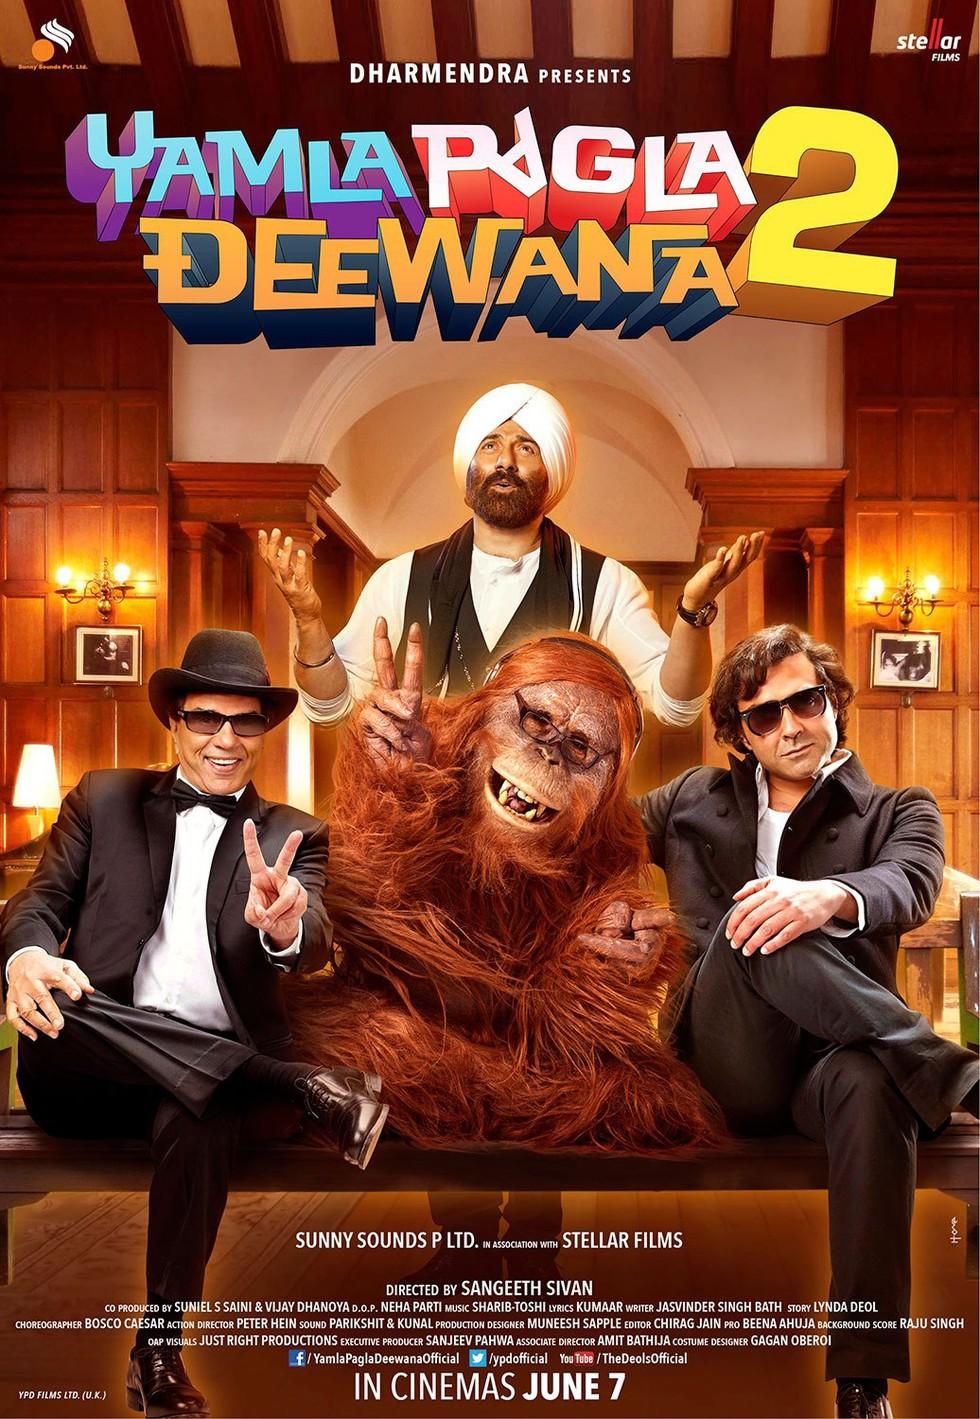 Yamla Pagla Deewana 2 - Movie Poster #7 (Large)